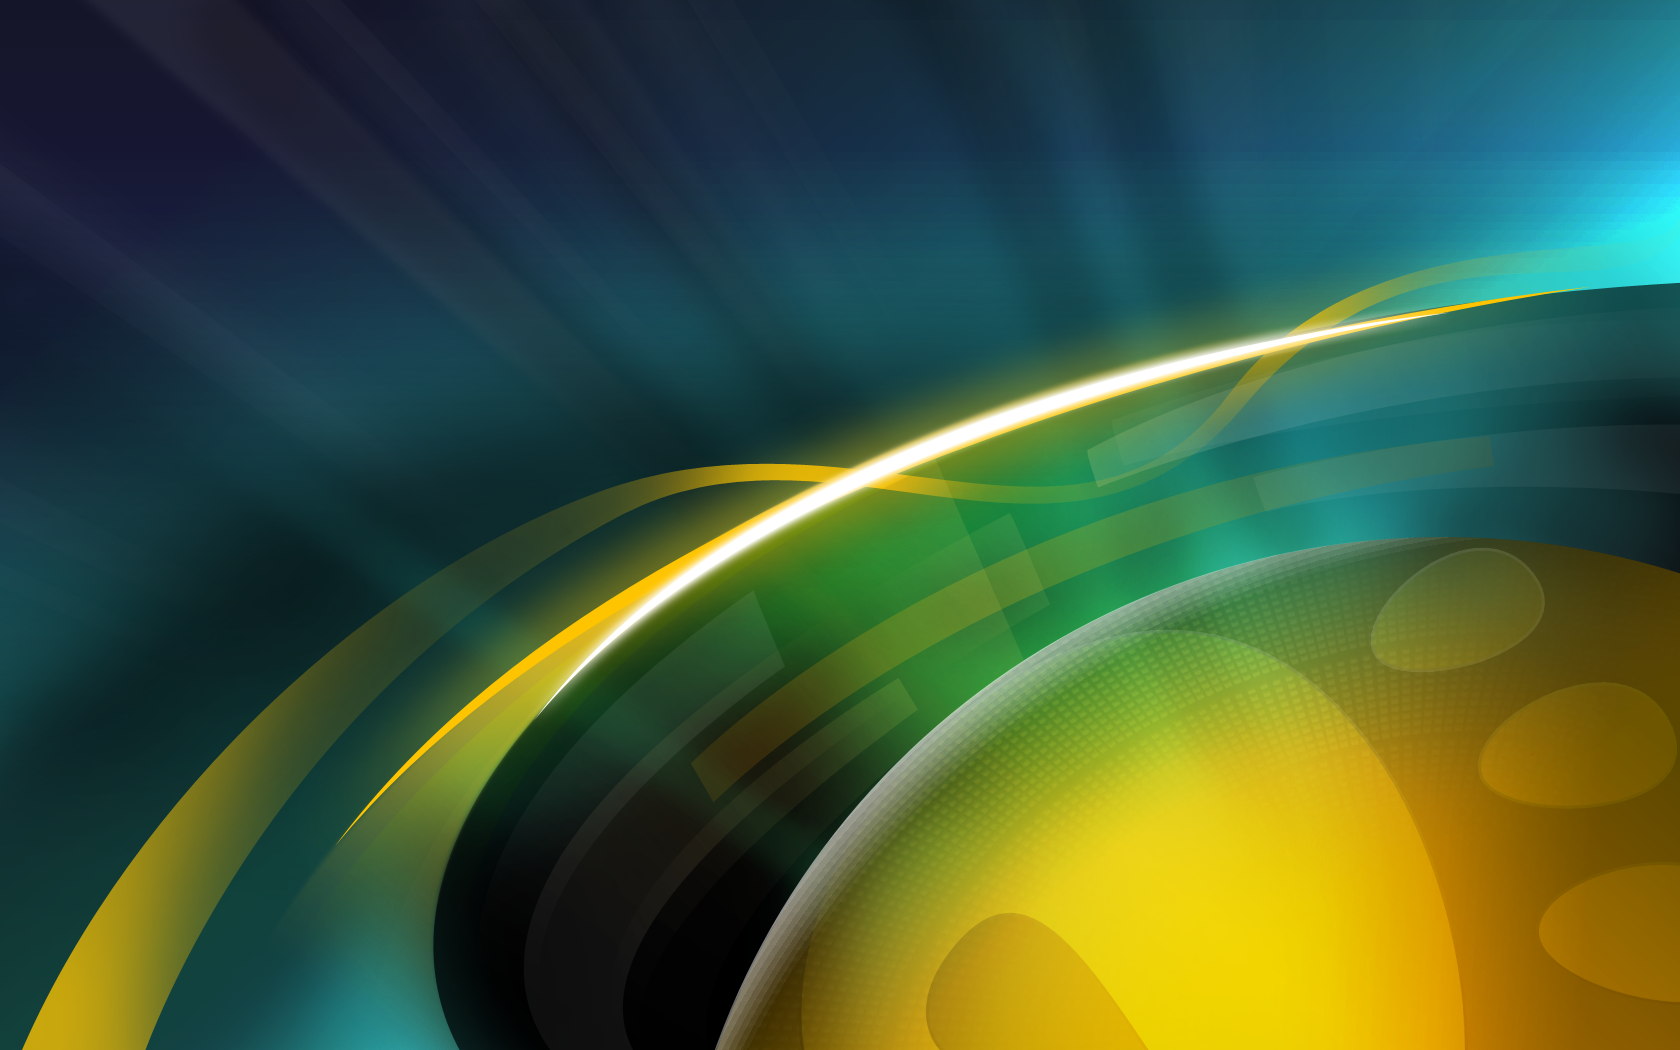 ABSTRACT-RayOfLight_1680x1050